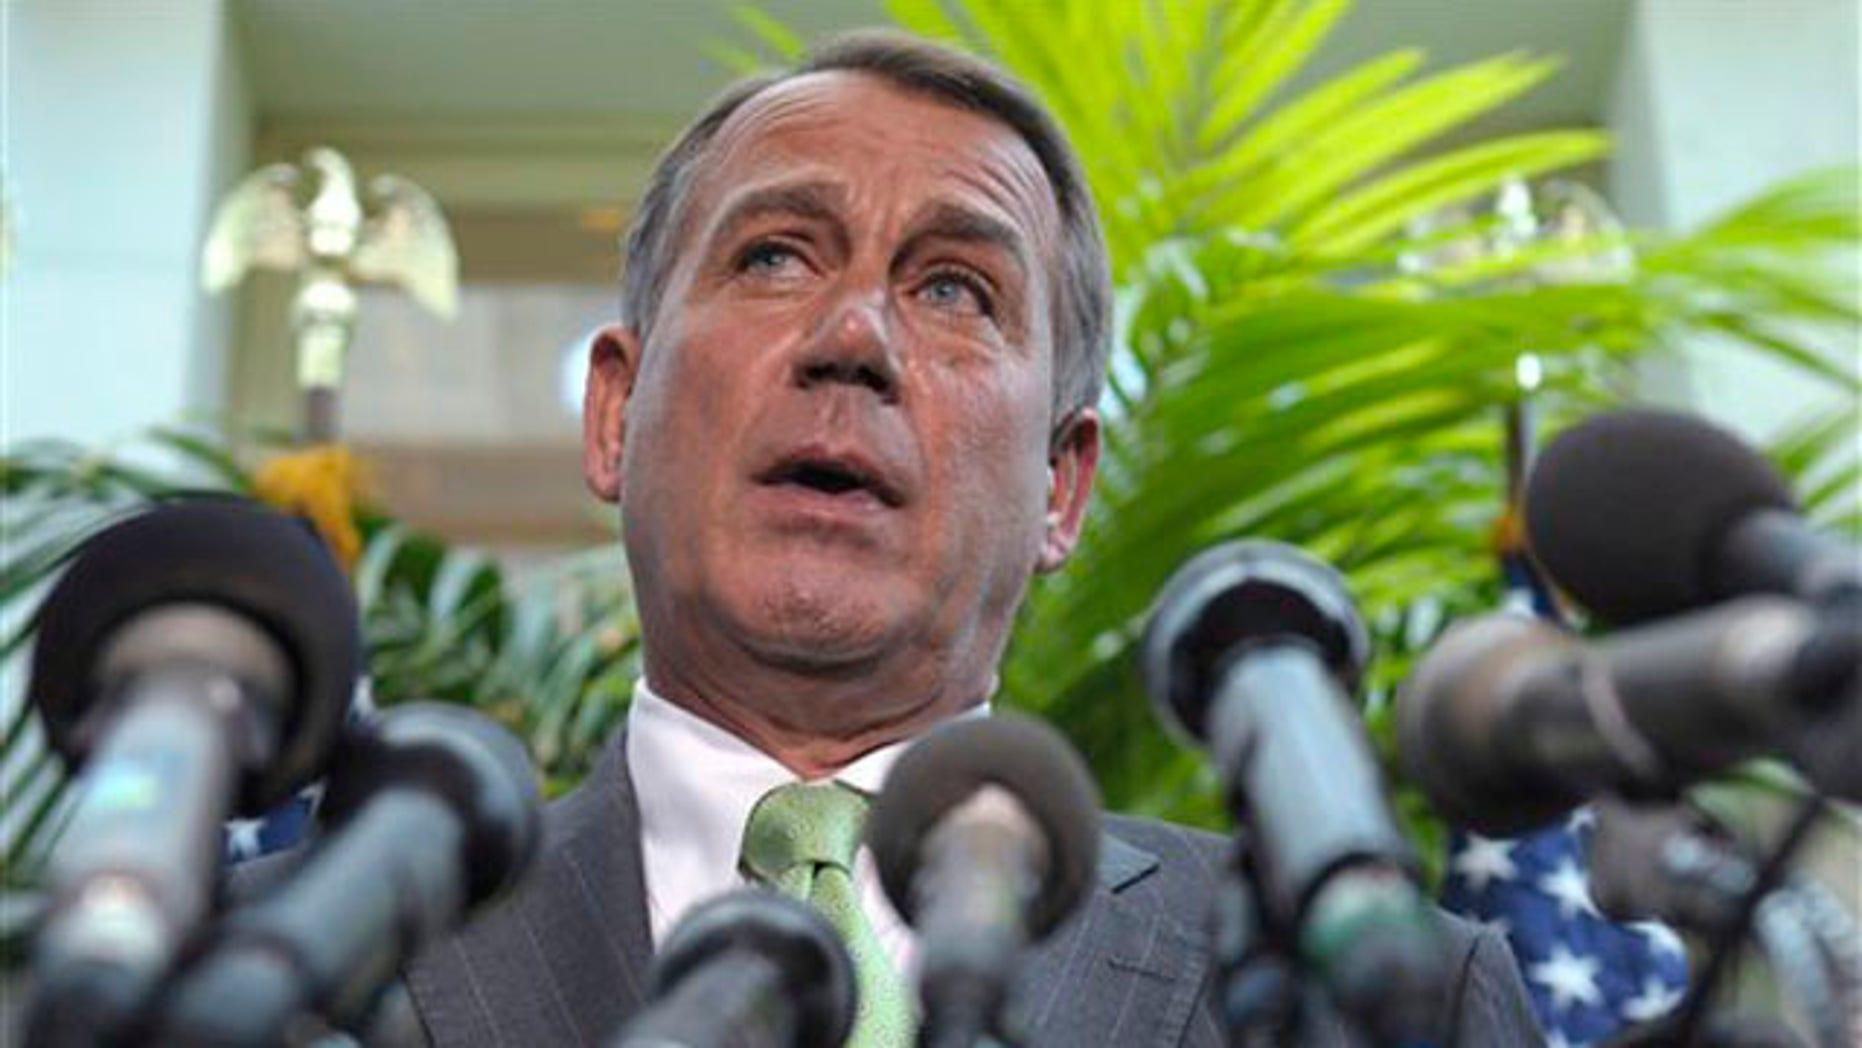 House Speaker John Boehner speaks at a news conference on Capitol Hill in Washington July 12.